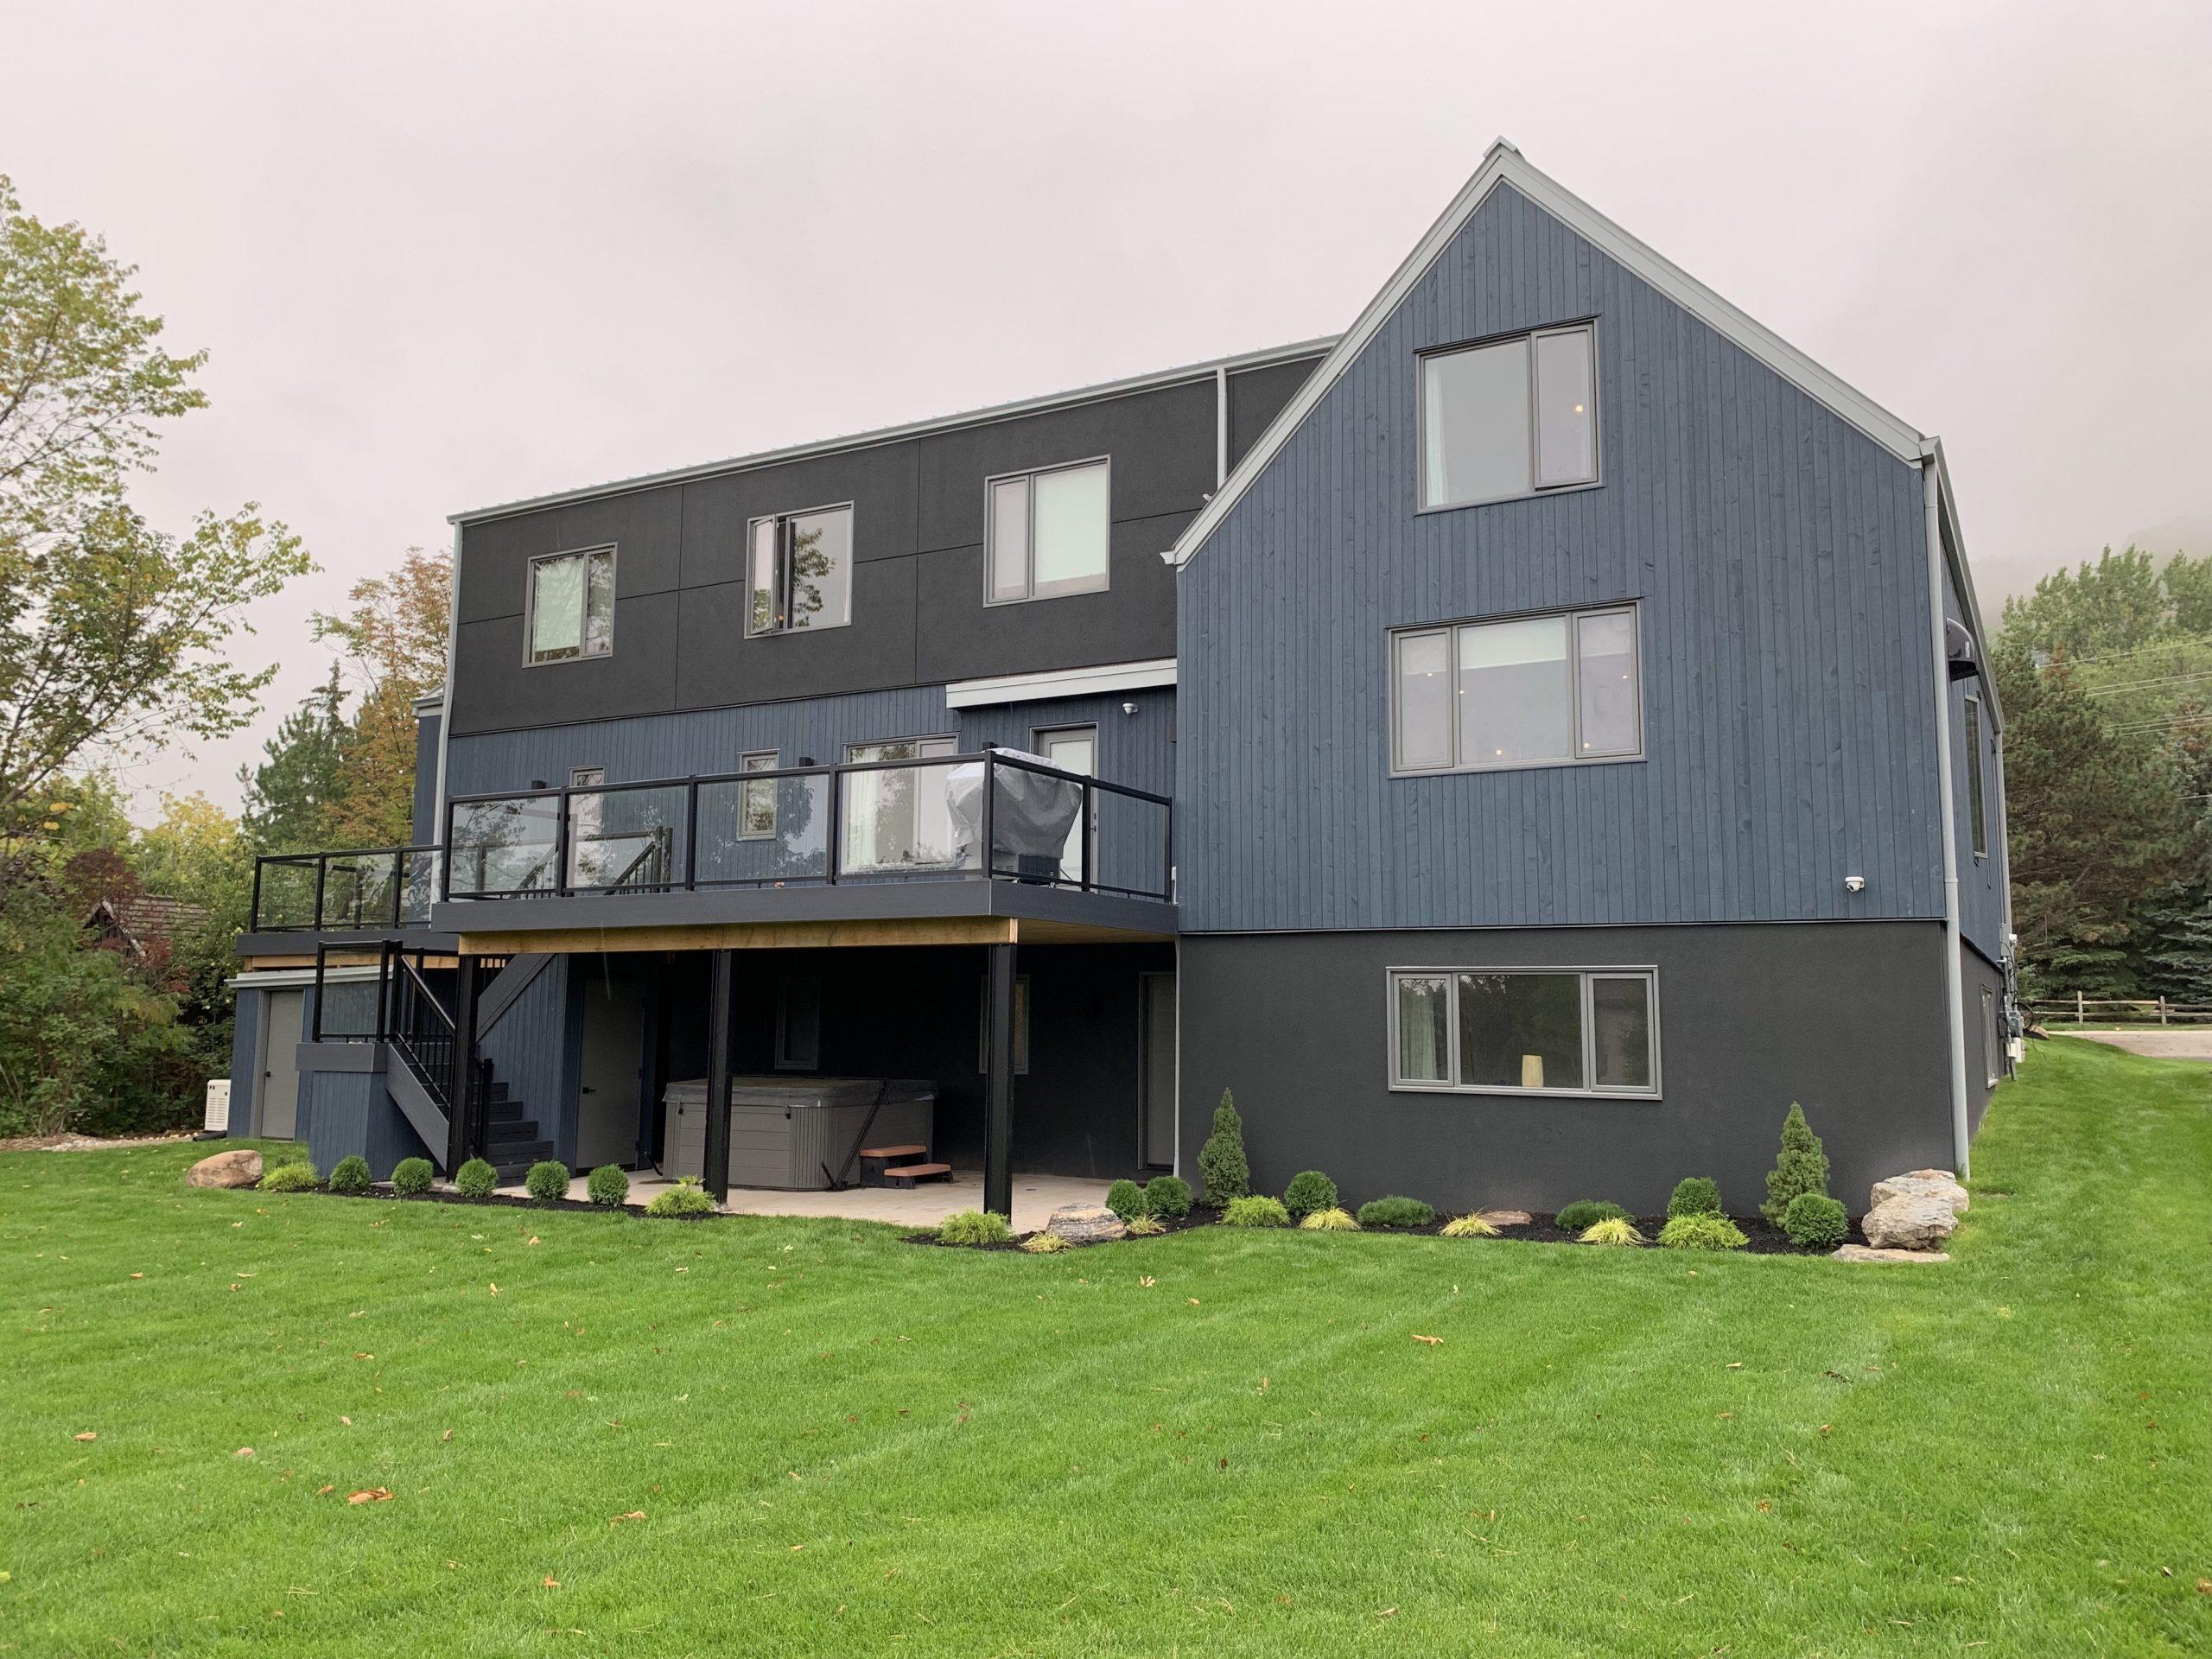 Normerica Timber Frame, Exterior, Rear View, Backyard